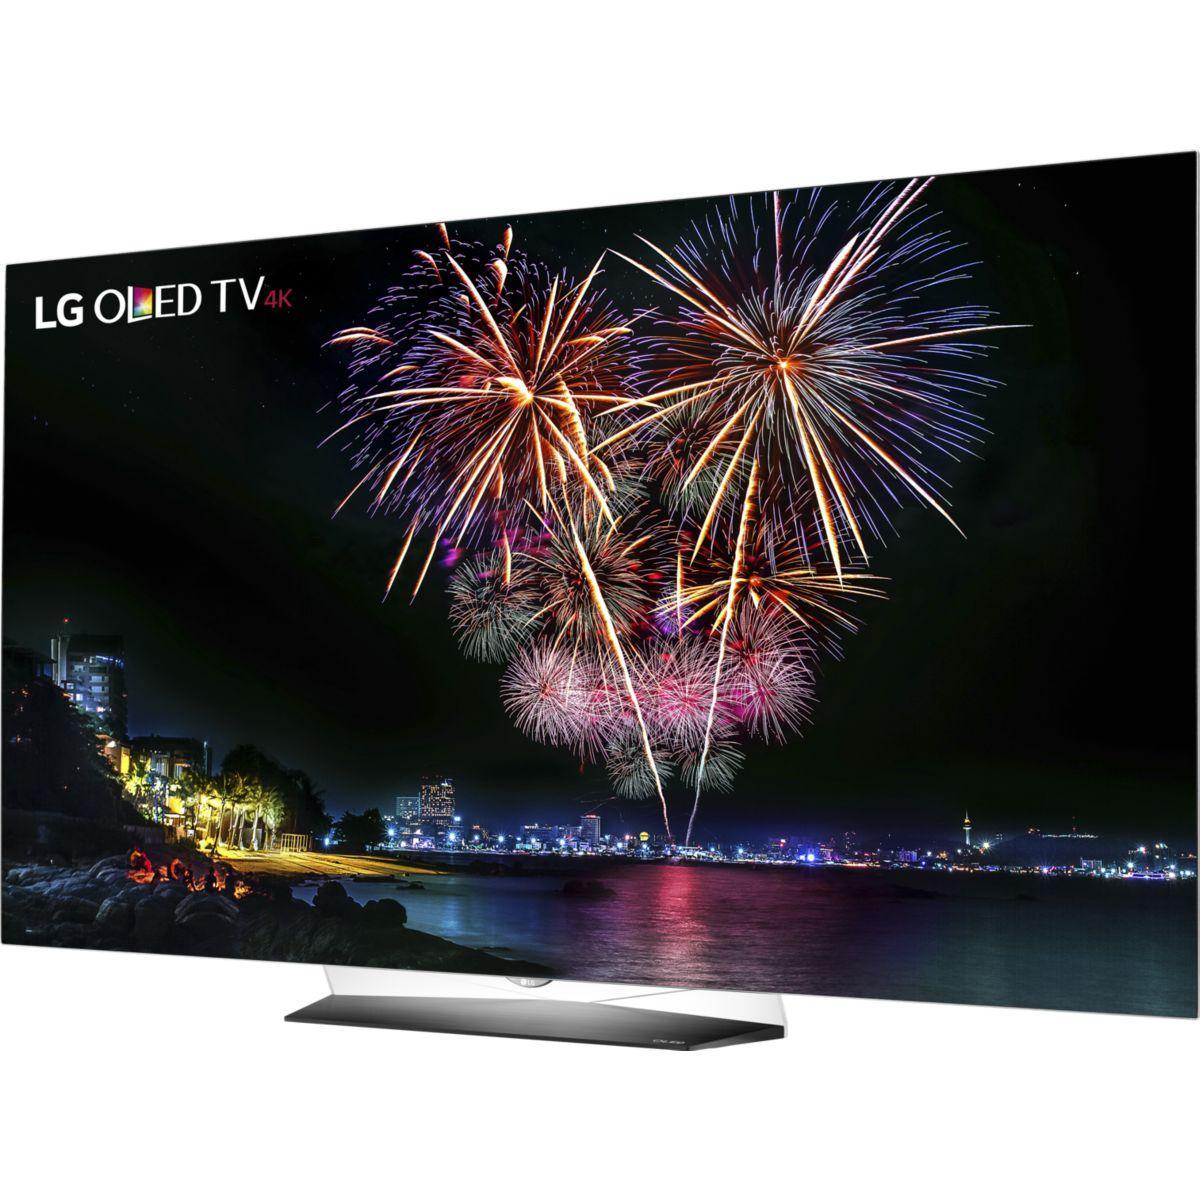 TV LG OLED65B6V